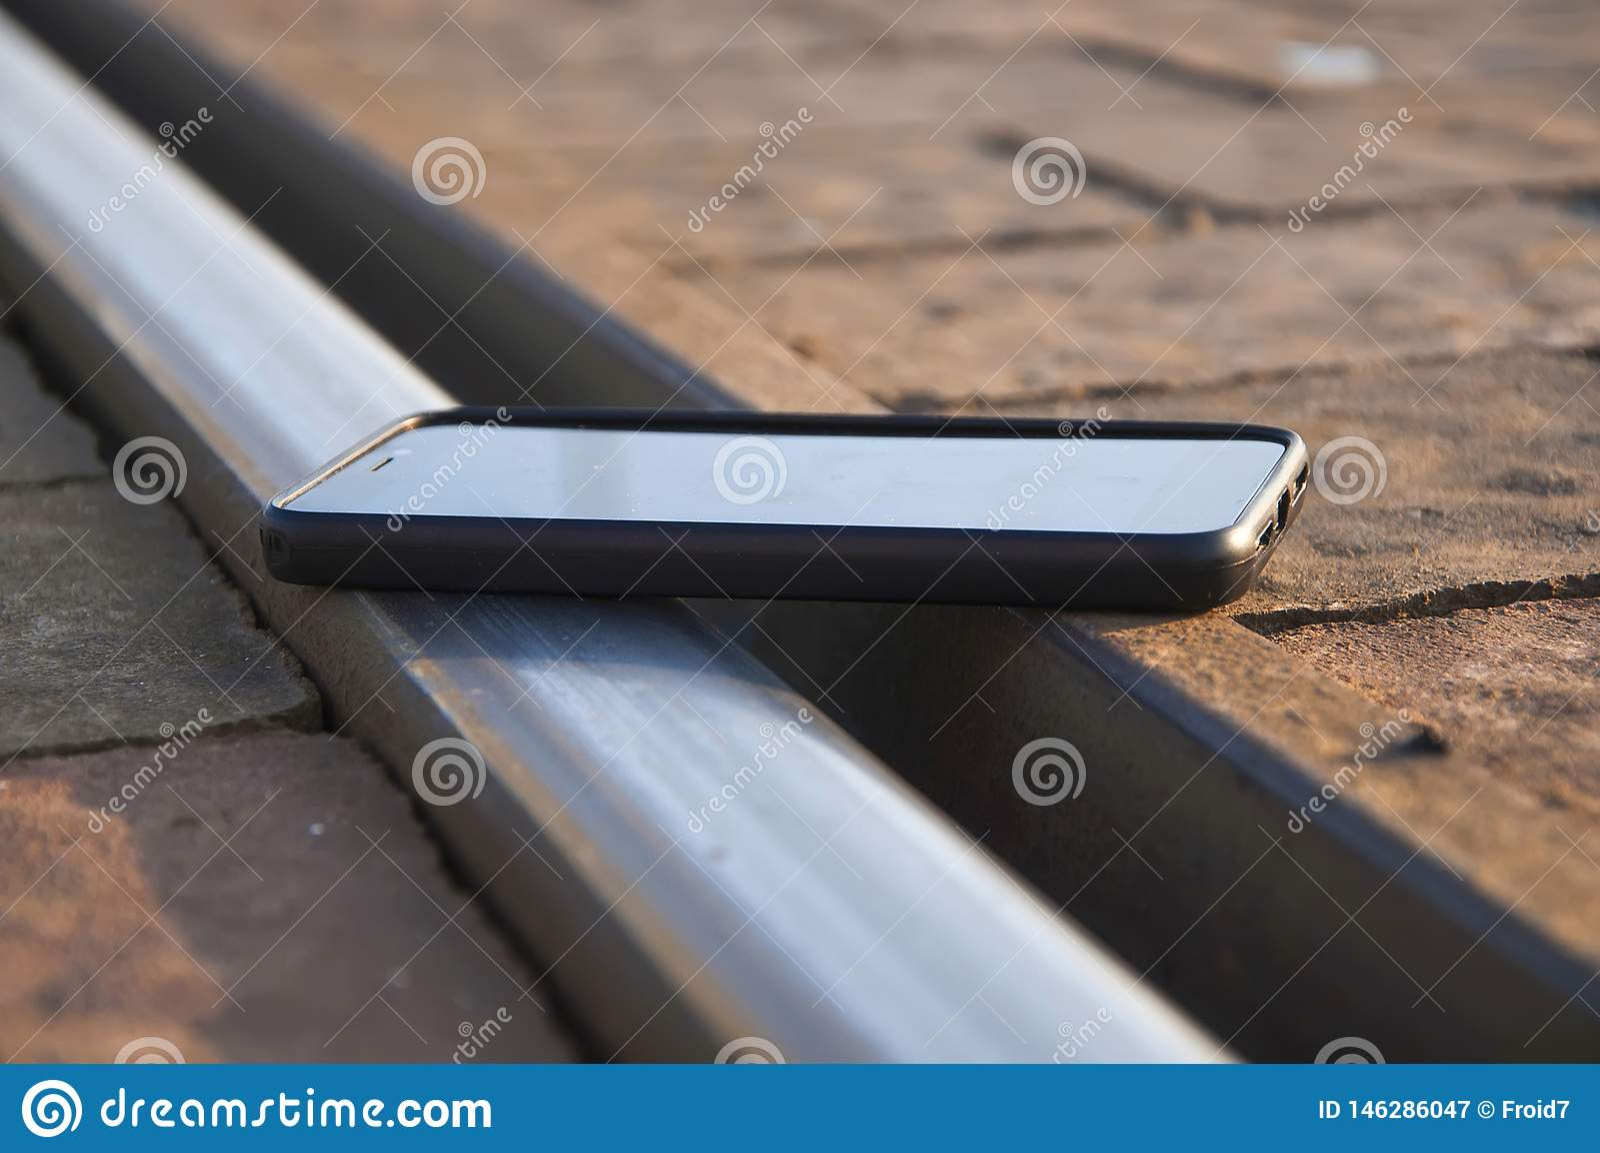 Smartphone on the railroad.